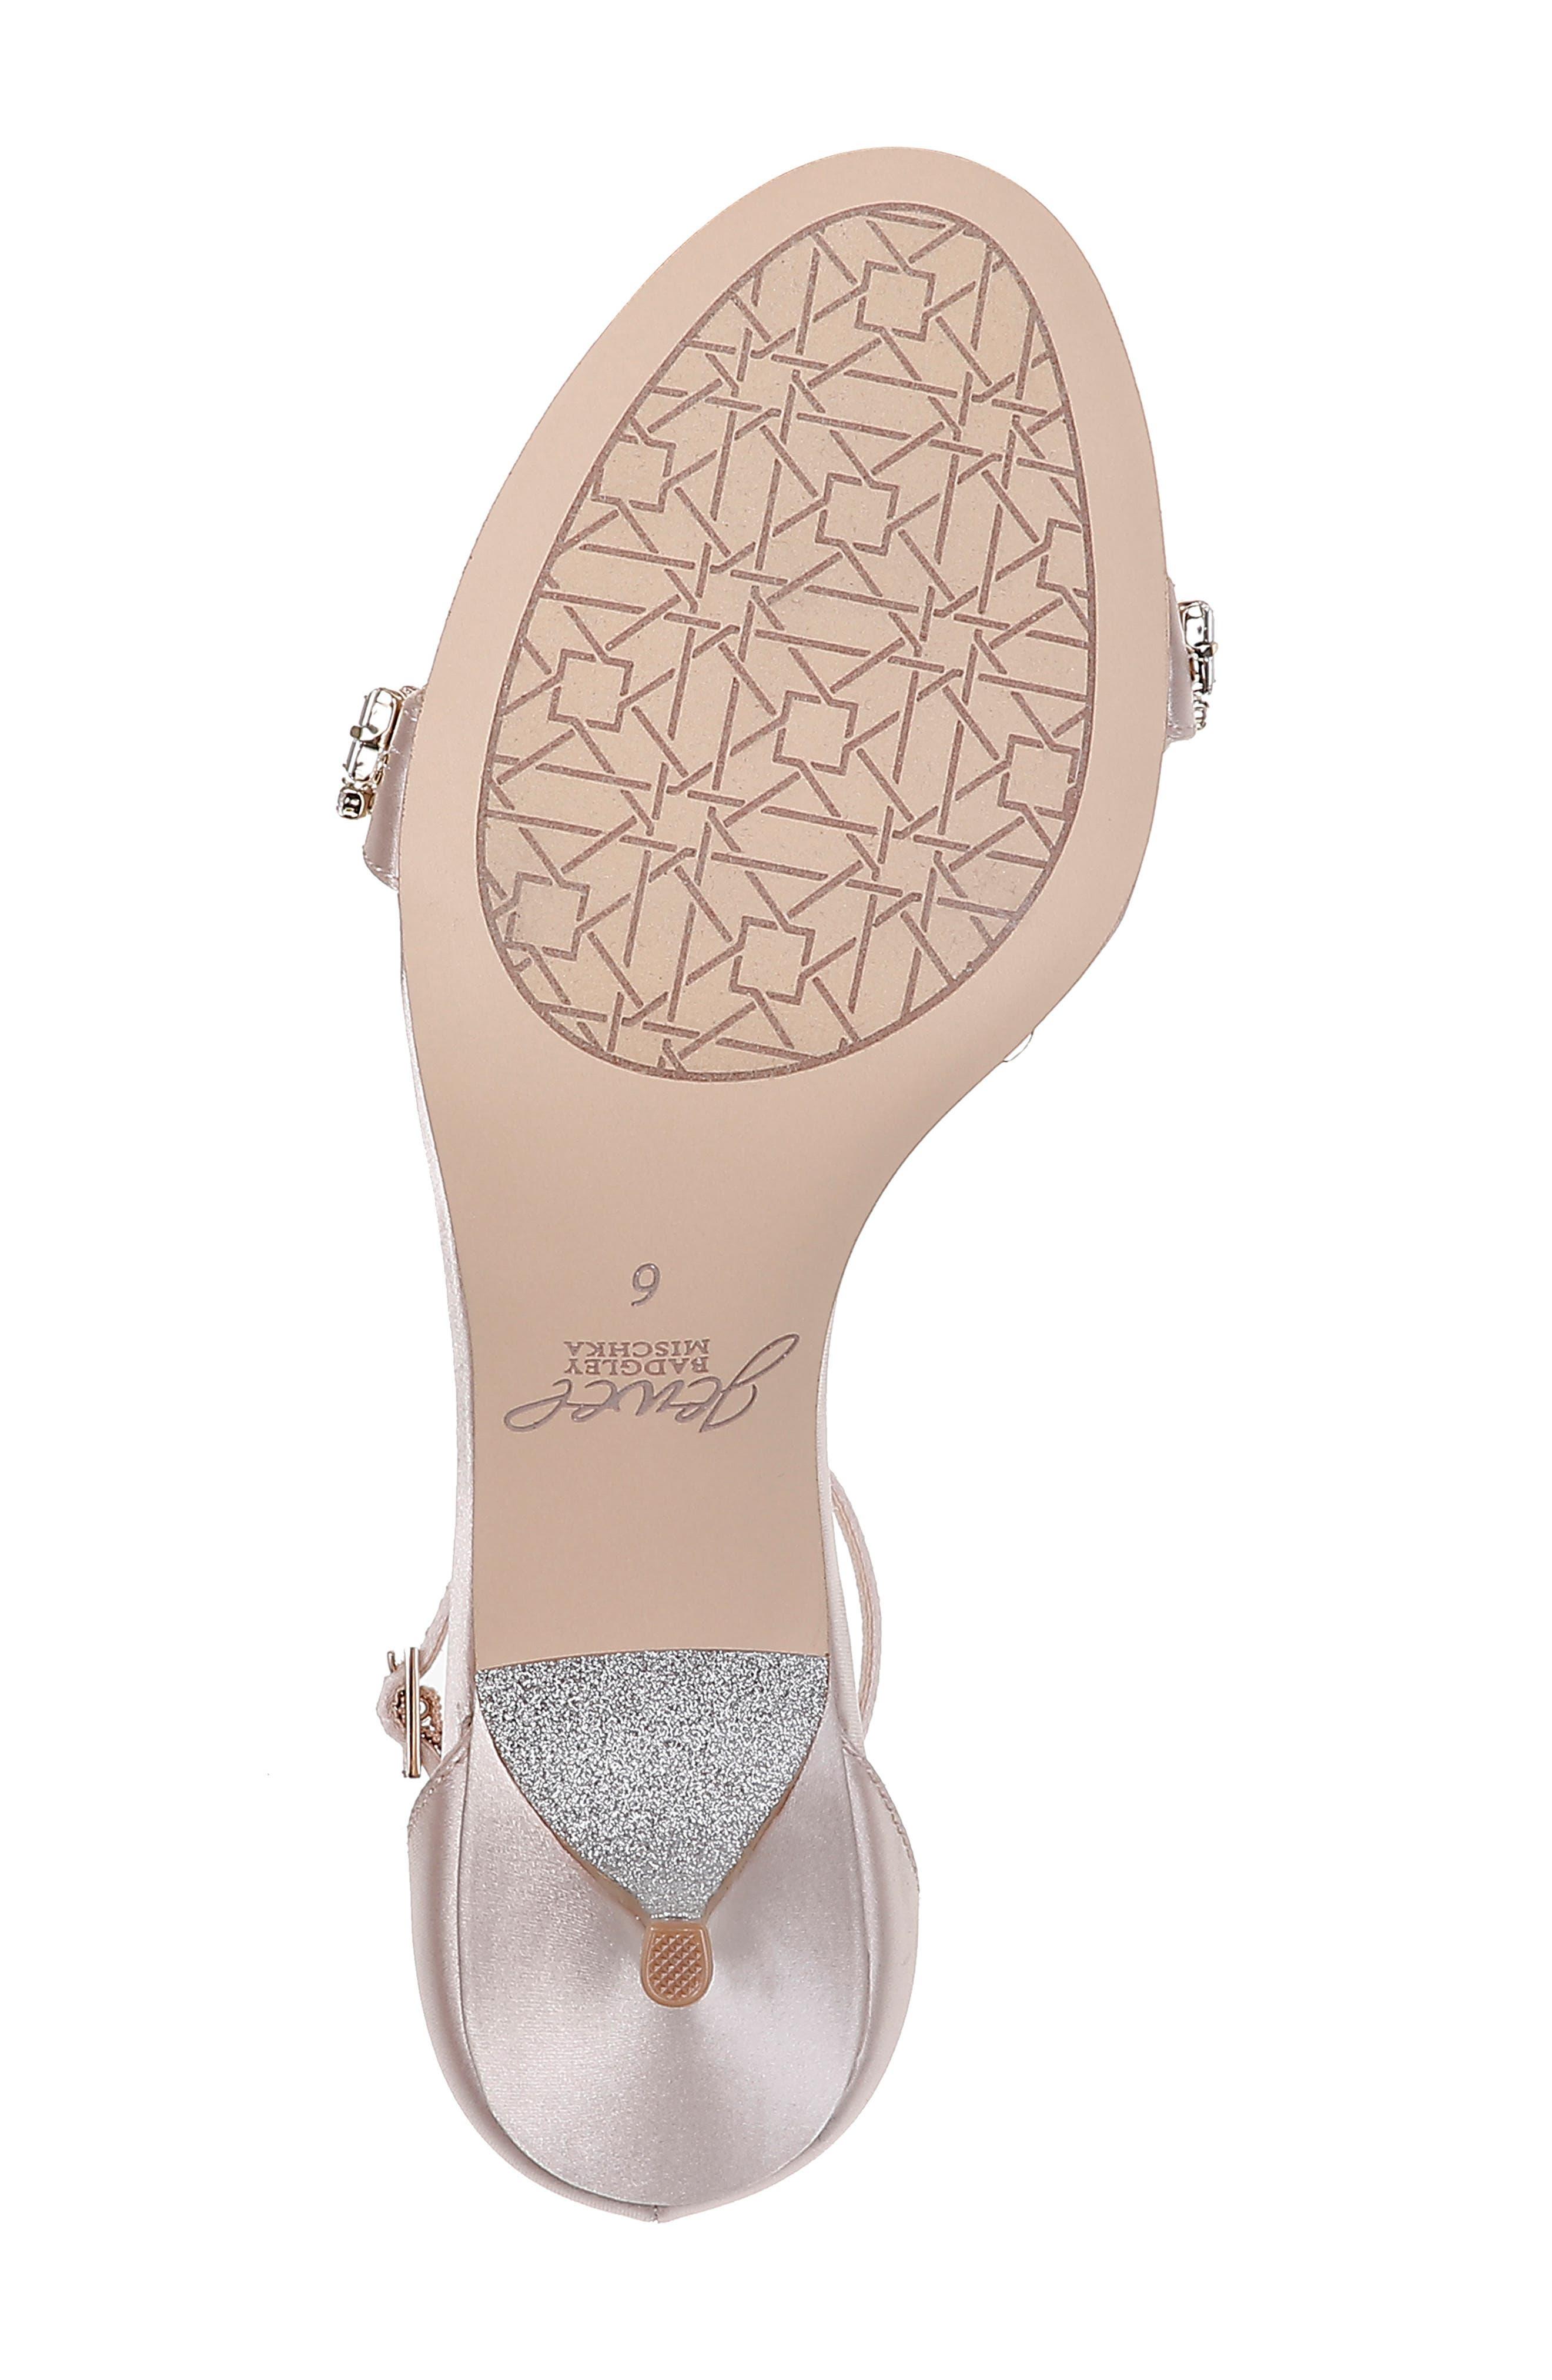 JEWEL BADGLEY MISCHKA, Dash Embellished Halo Strap Sandal, Alternate thumbnail 6, color, CHAMPAGNE SATIN